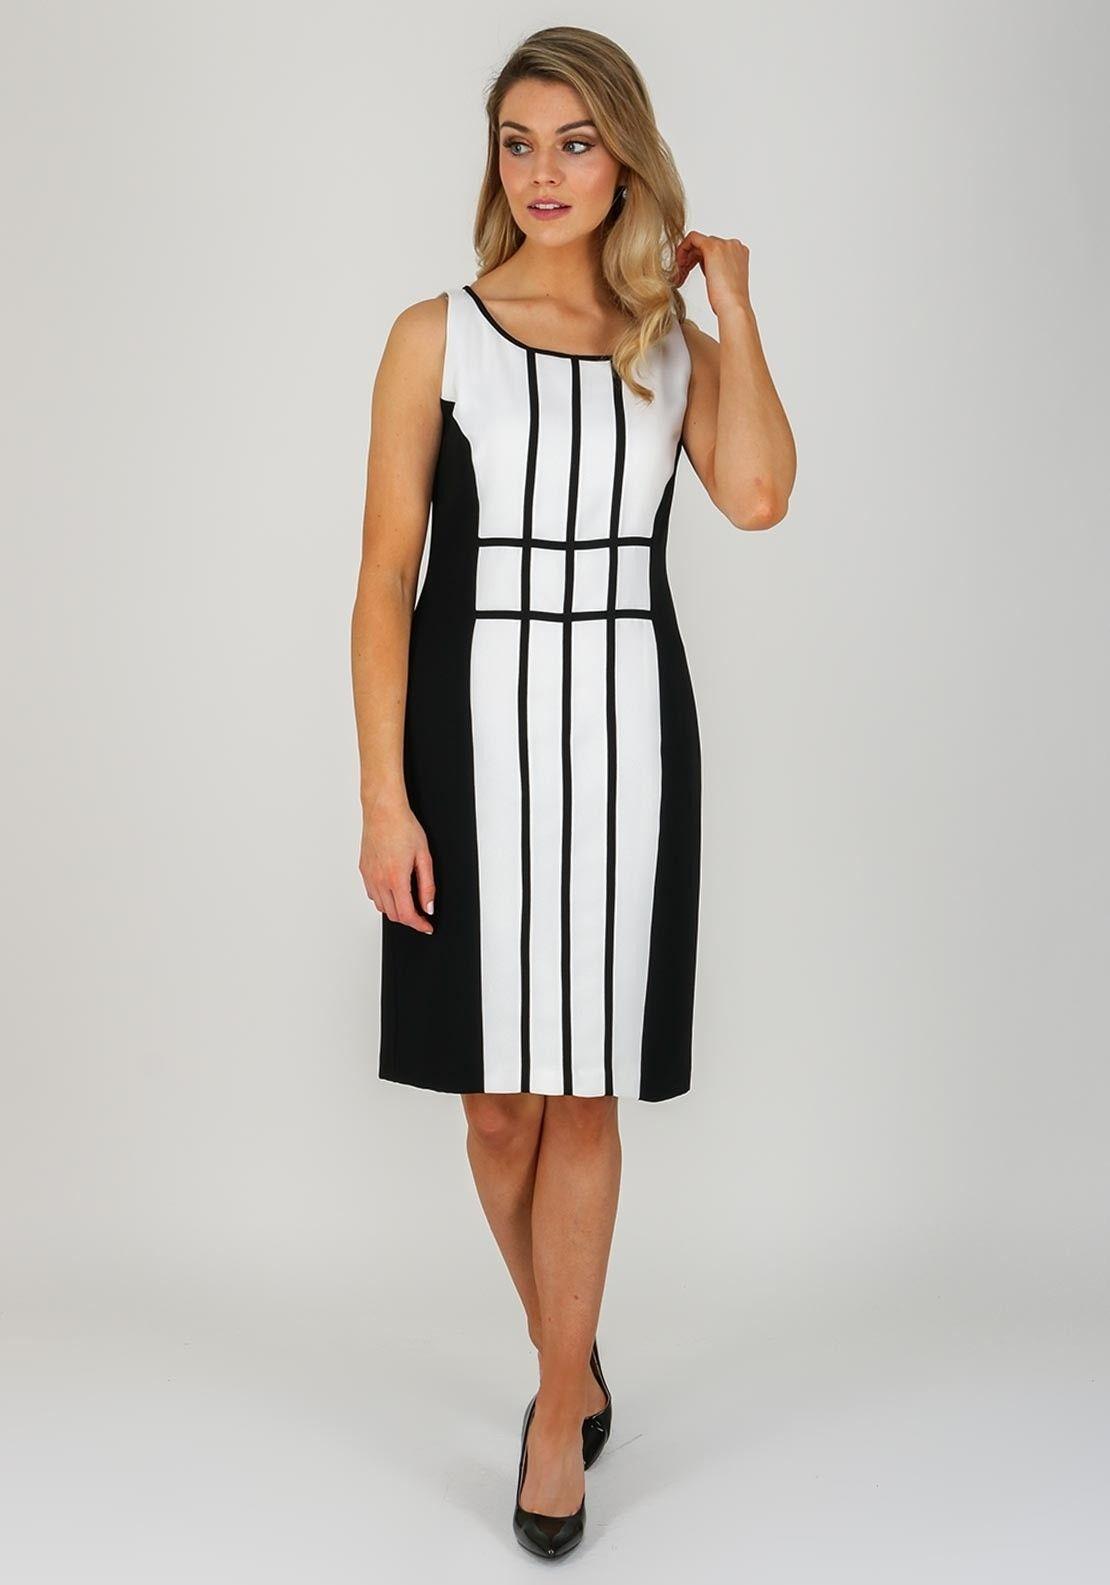 9f37964f7a941 Michaela Louisa Grid Print Dress, Black & White | Ladies Day ...